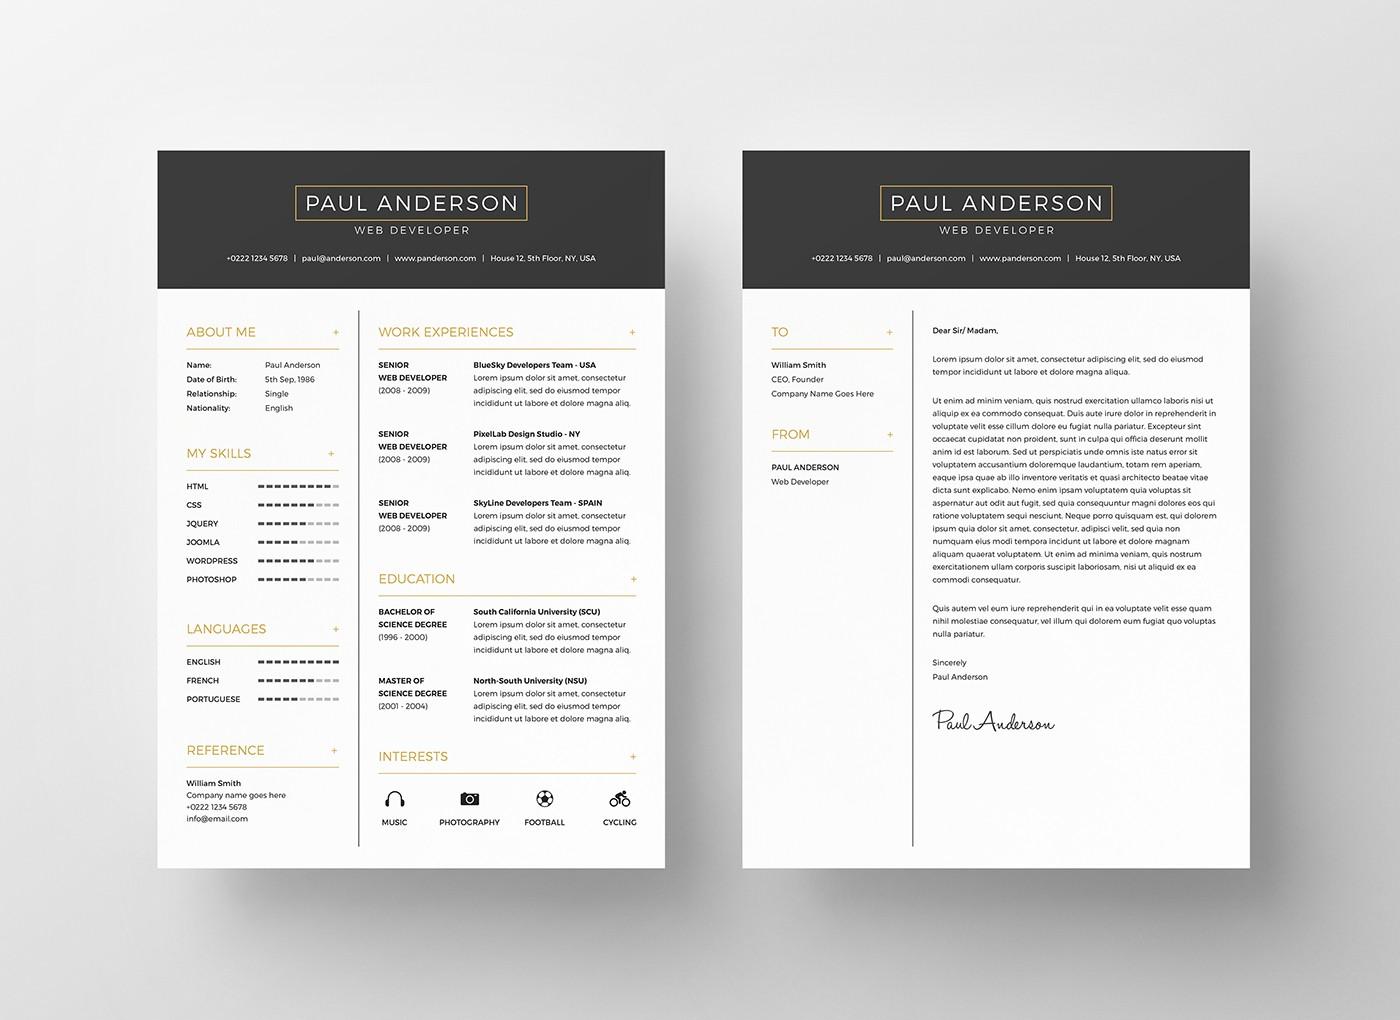 2 column resume template word  40 Free Printable CV Templates in 2017 to Get a Perfect Job - 2 column resume template word